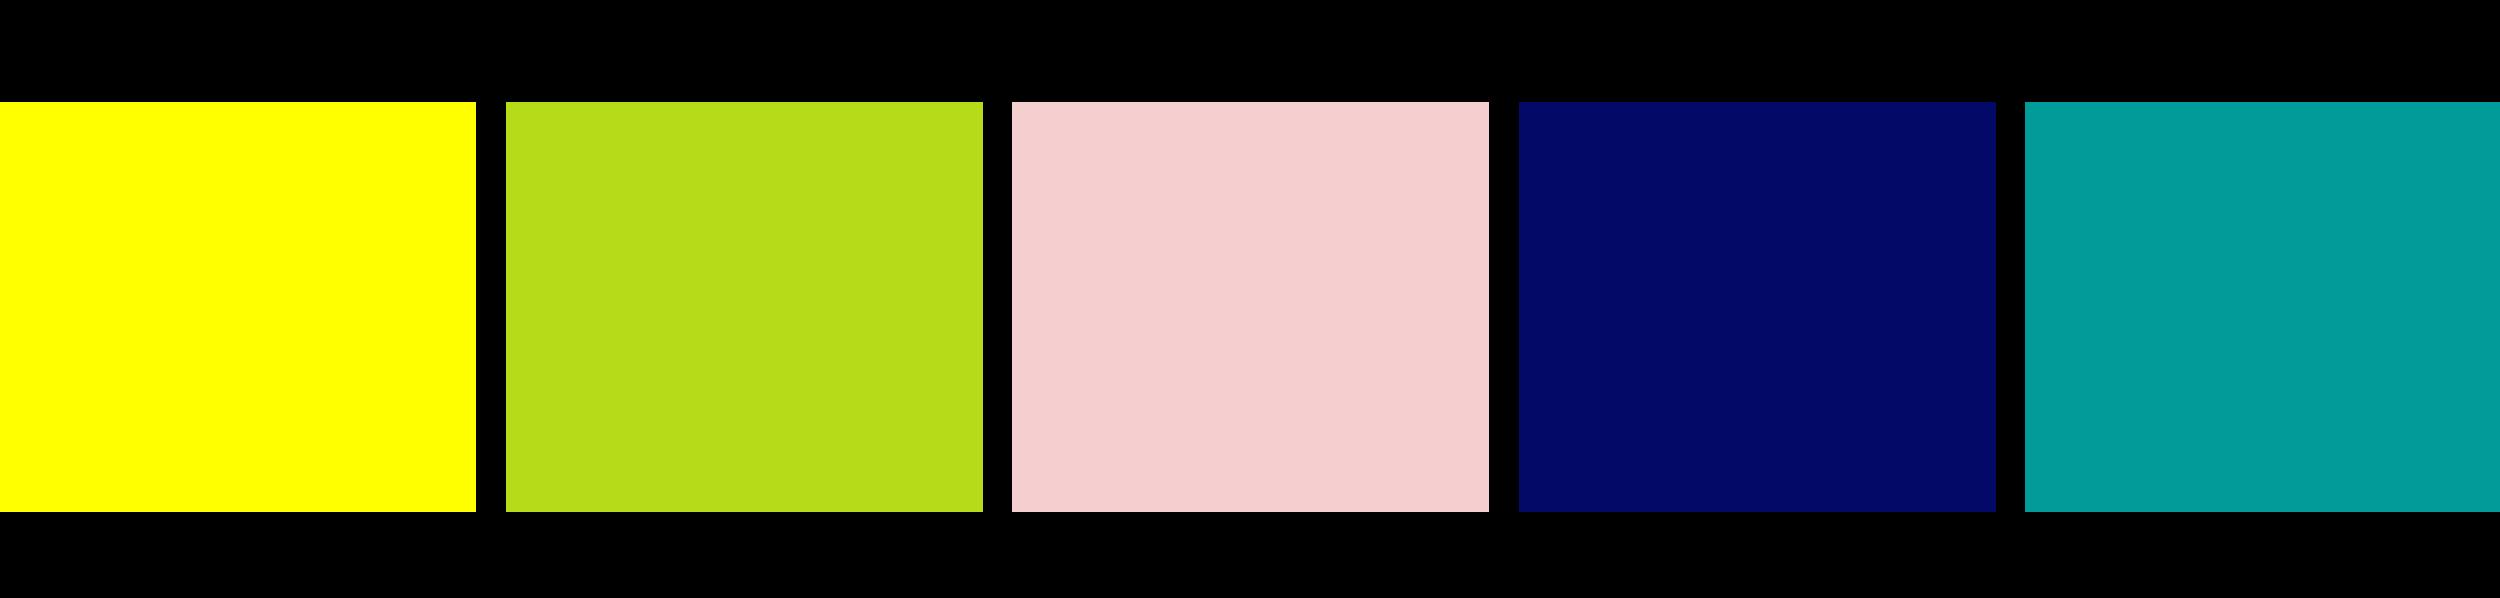 Dark Skin Clothing Color Palette Guide